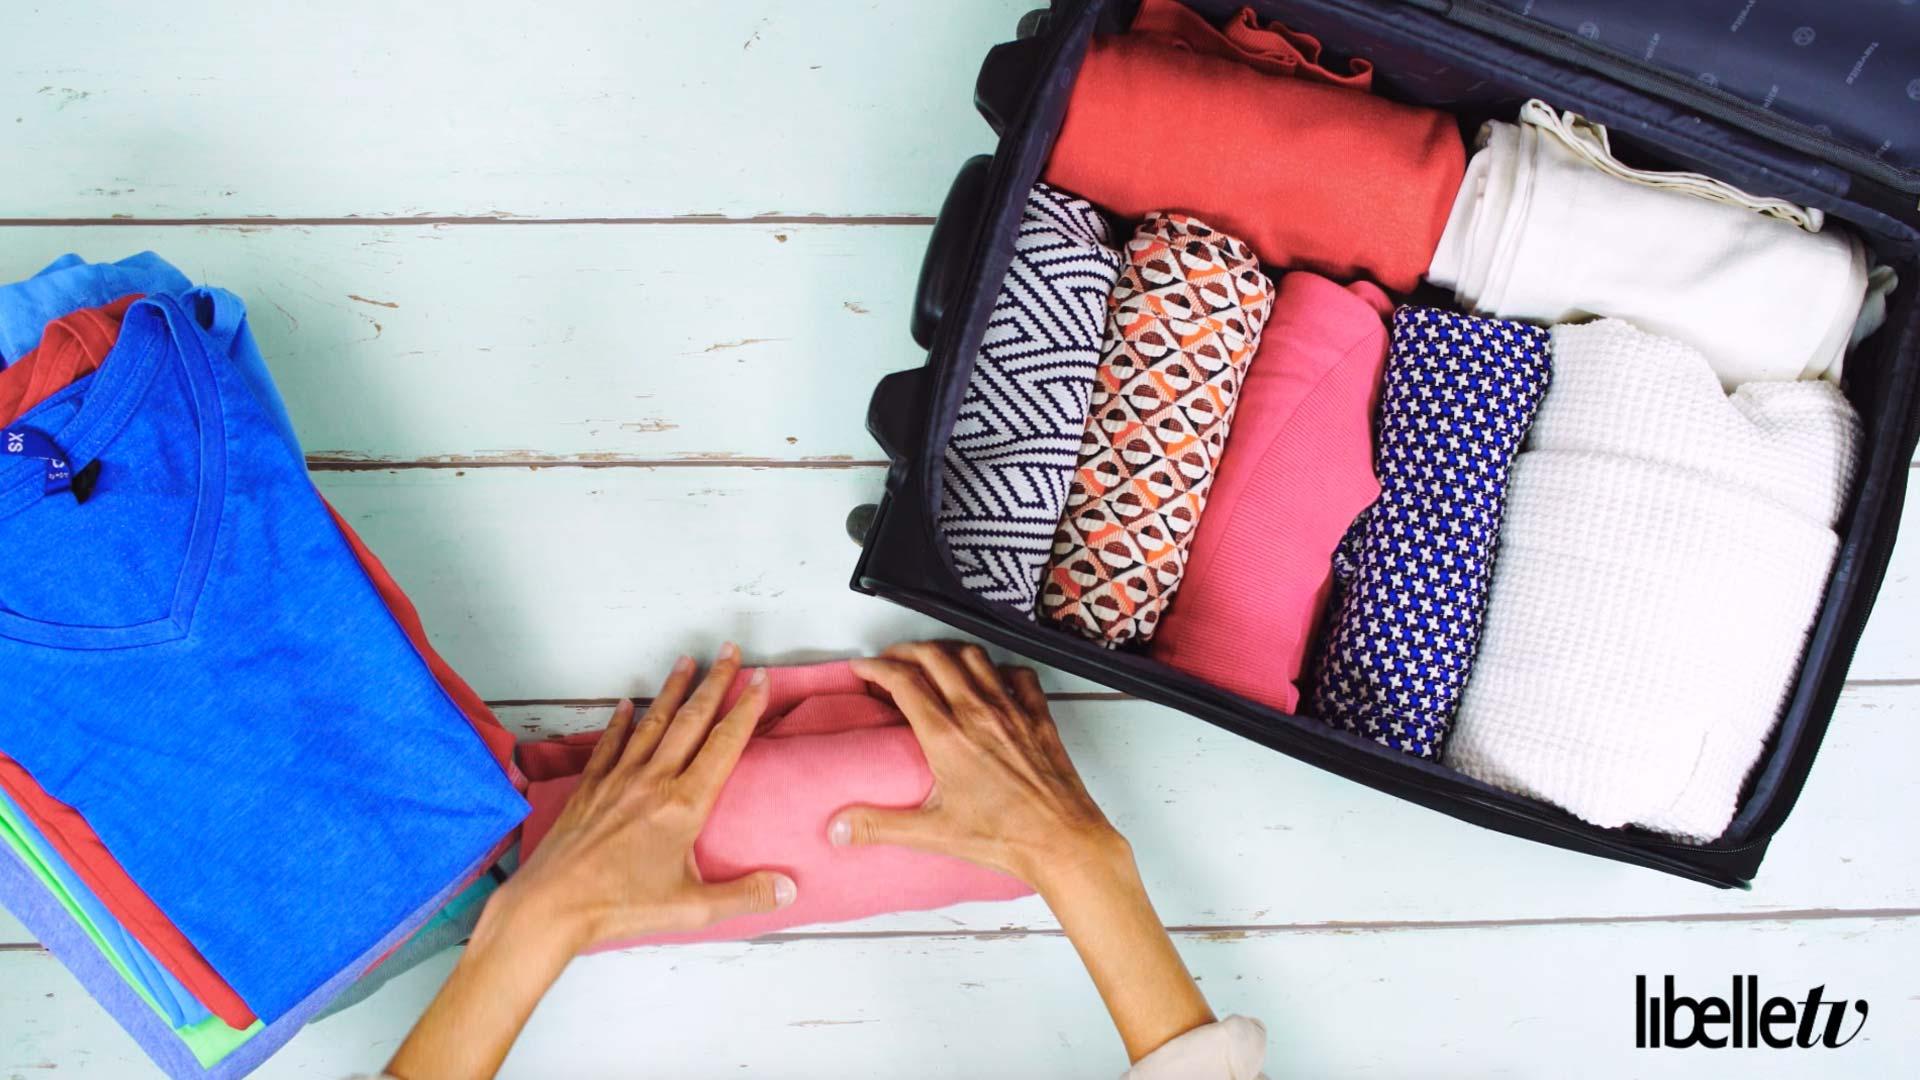 Lifehack vakantiekoffer kleding